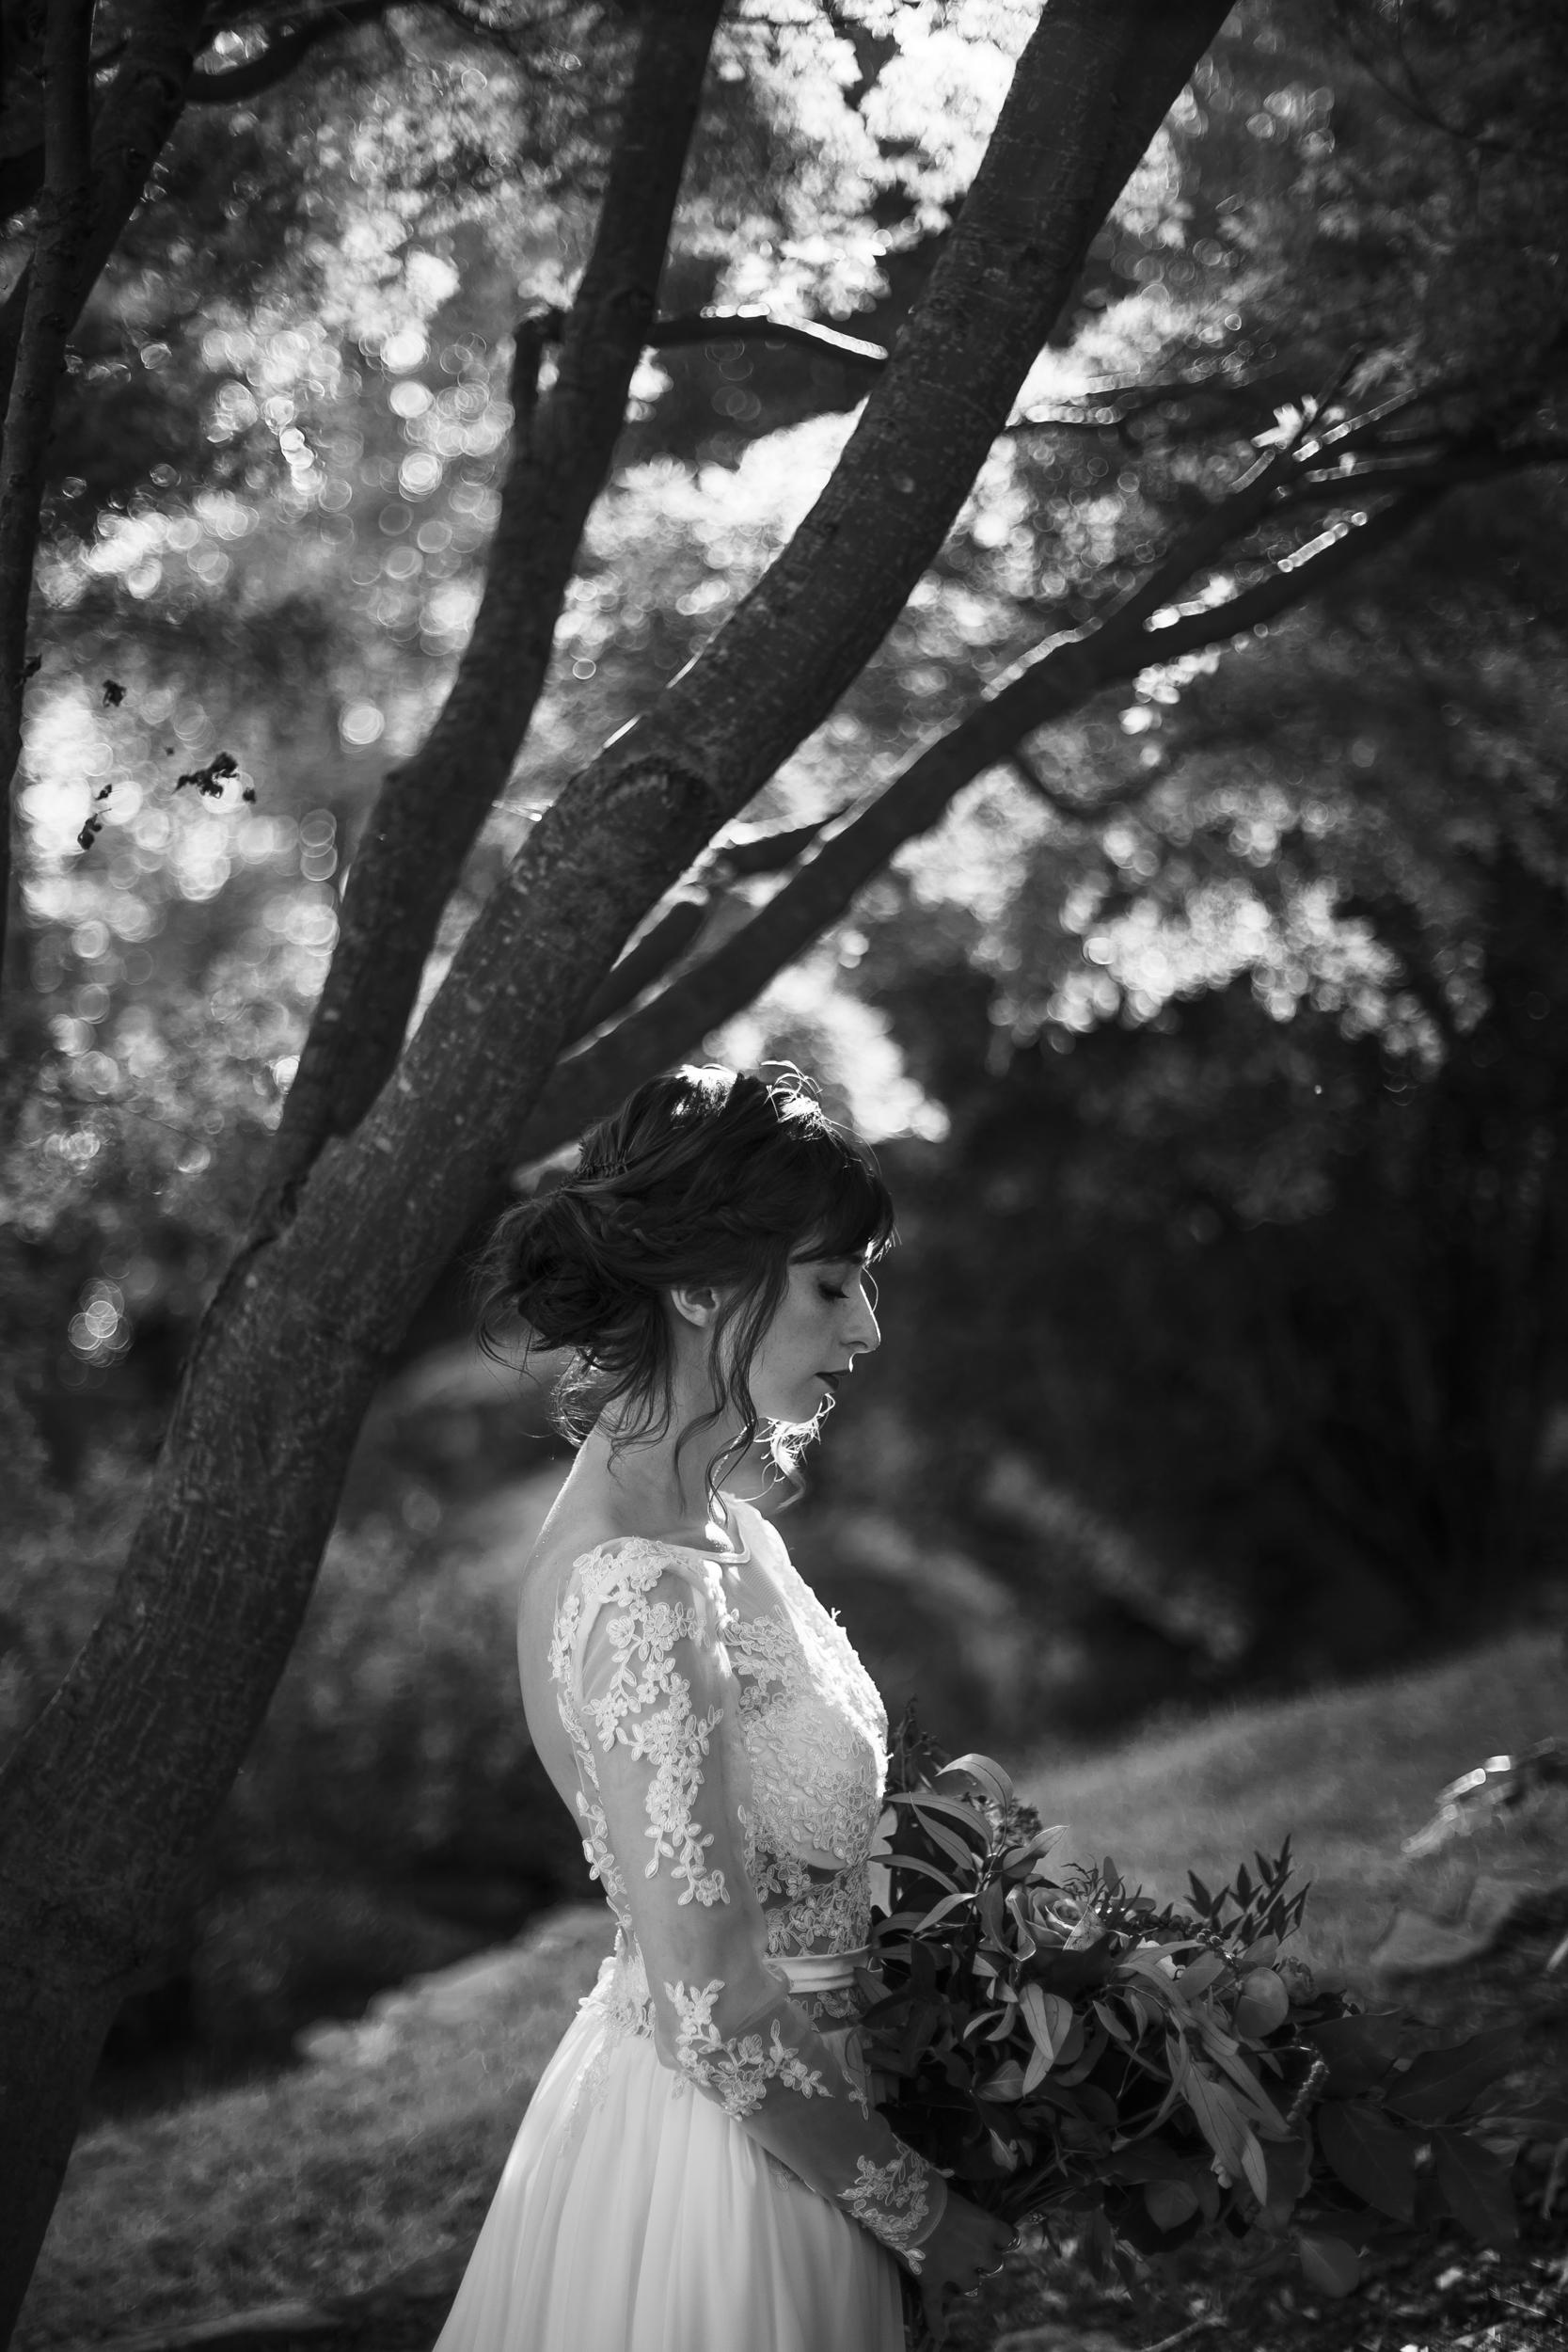 Laurel Falls Wedding October 2018_Allison and Josh__Lola Salon_Flora_Photo by Studio Misha Photography-68.jpg